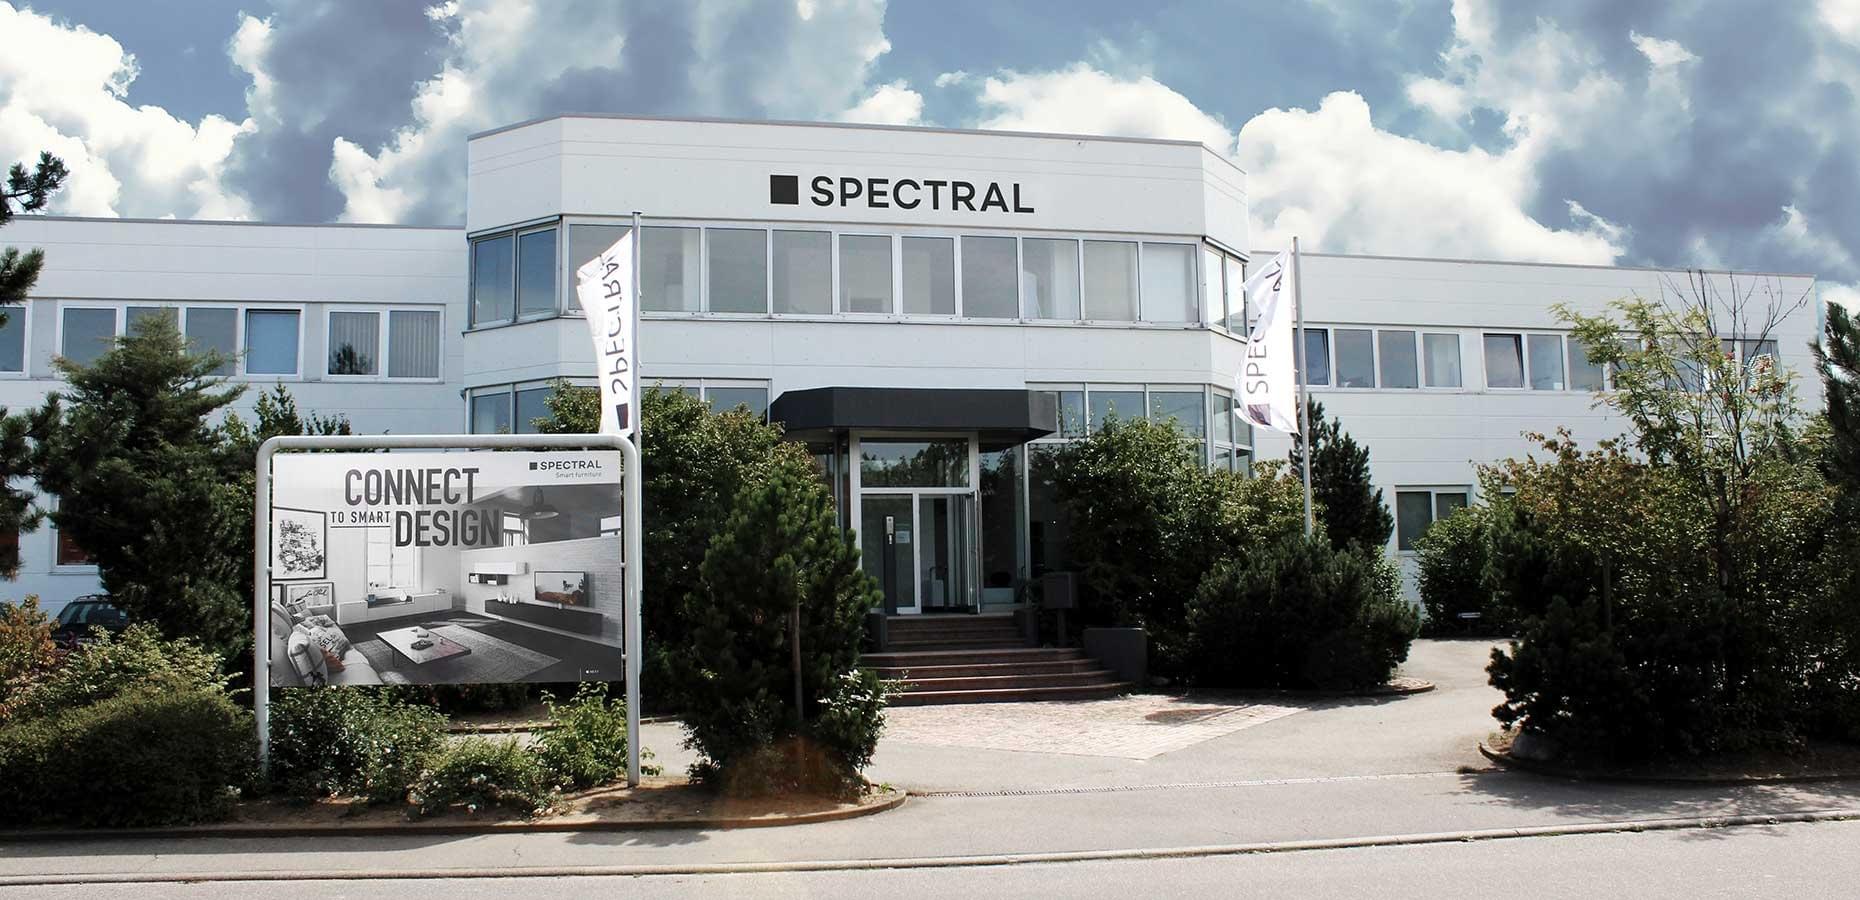 spectral-08_1450x962